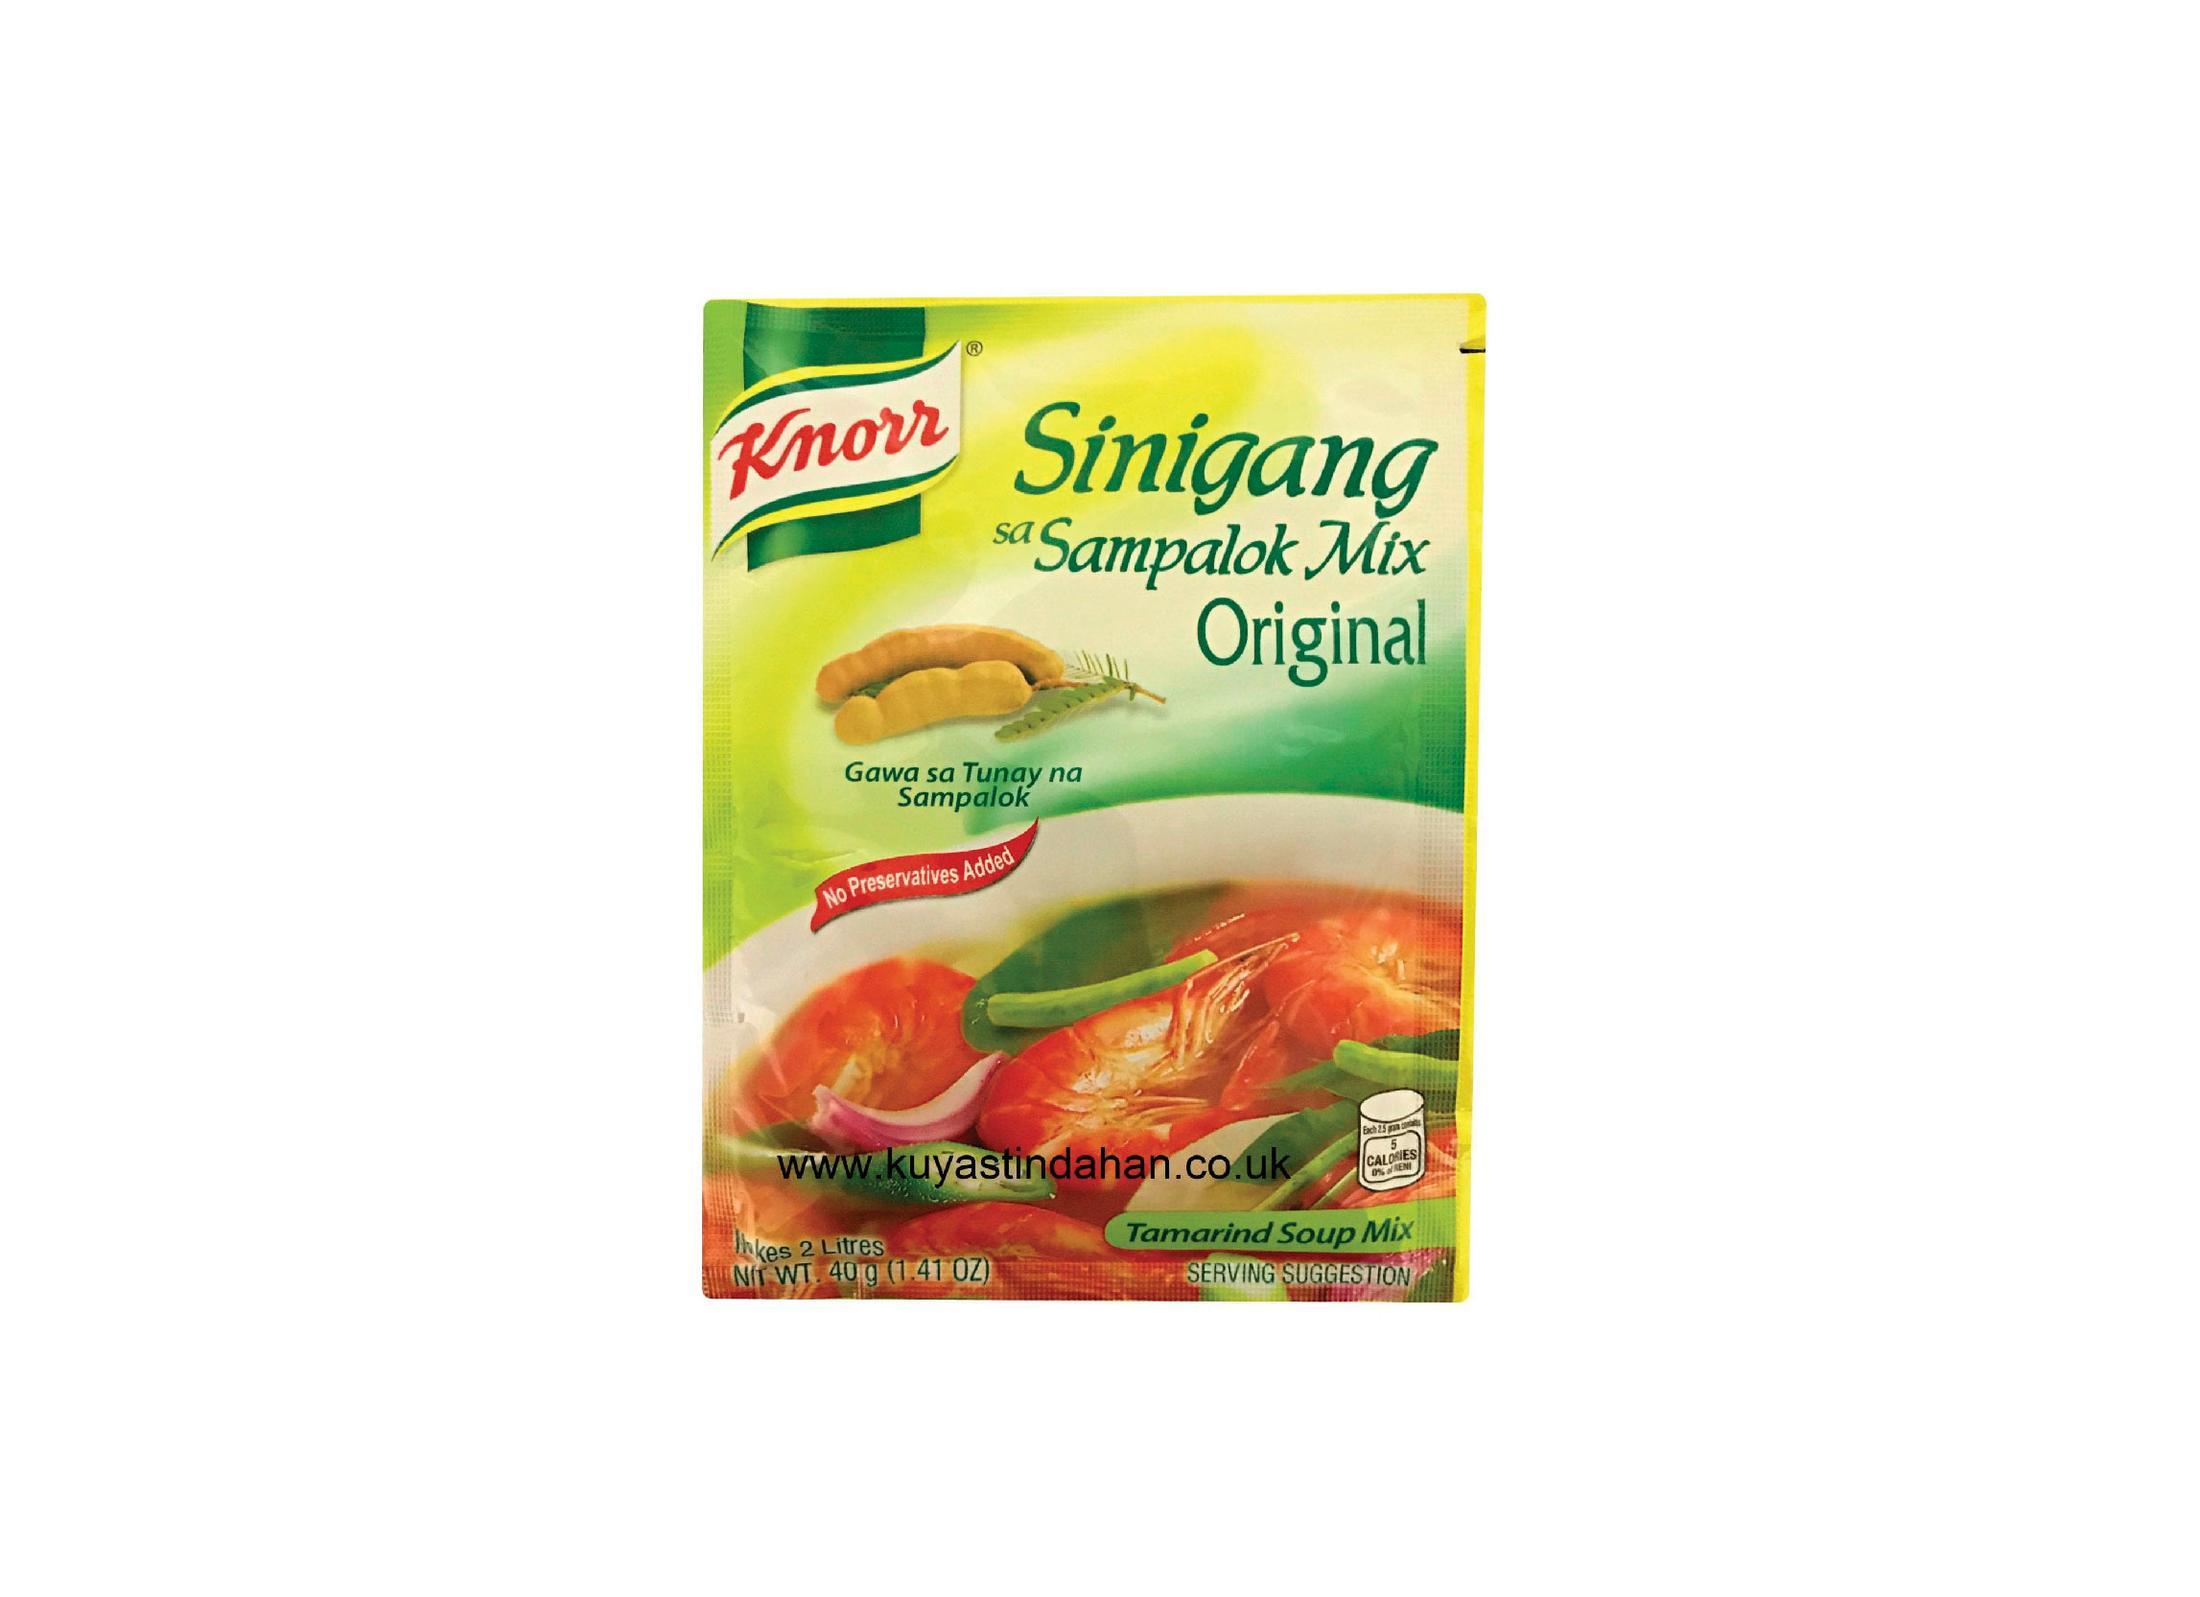 Sinigang Mix 0.04kg/Pack